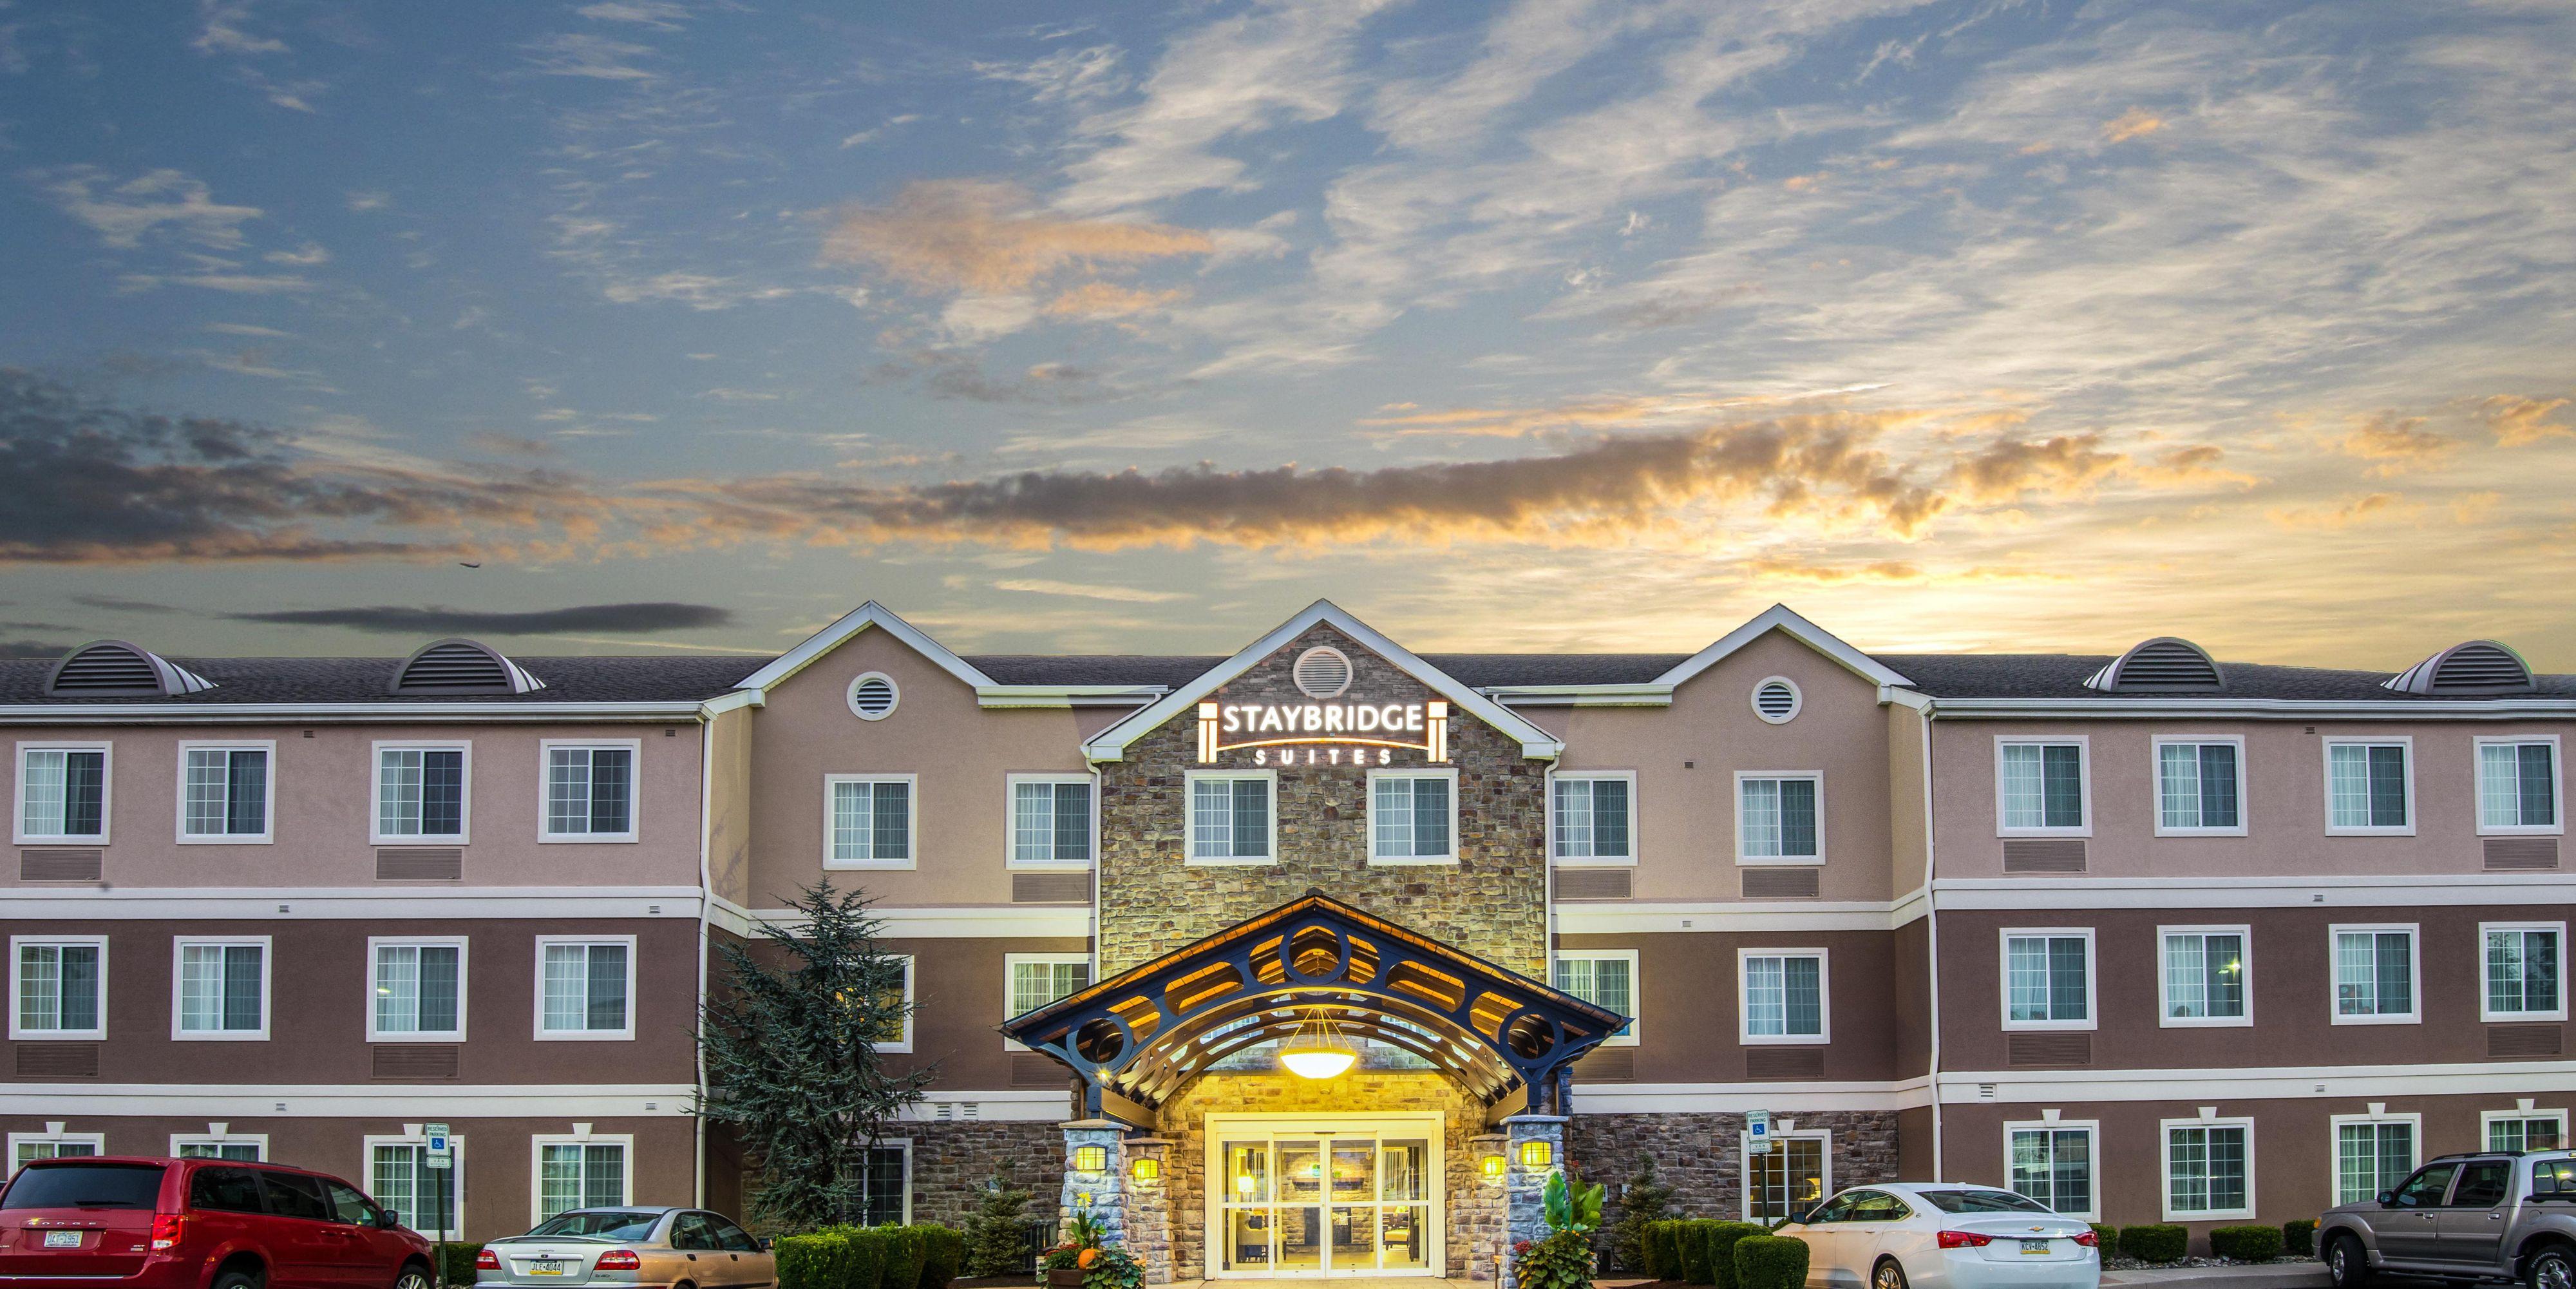 Staybridge Suites Allentown West Allentown Pennsylvania